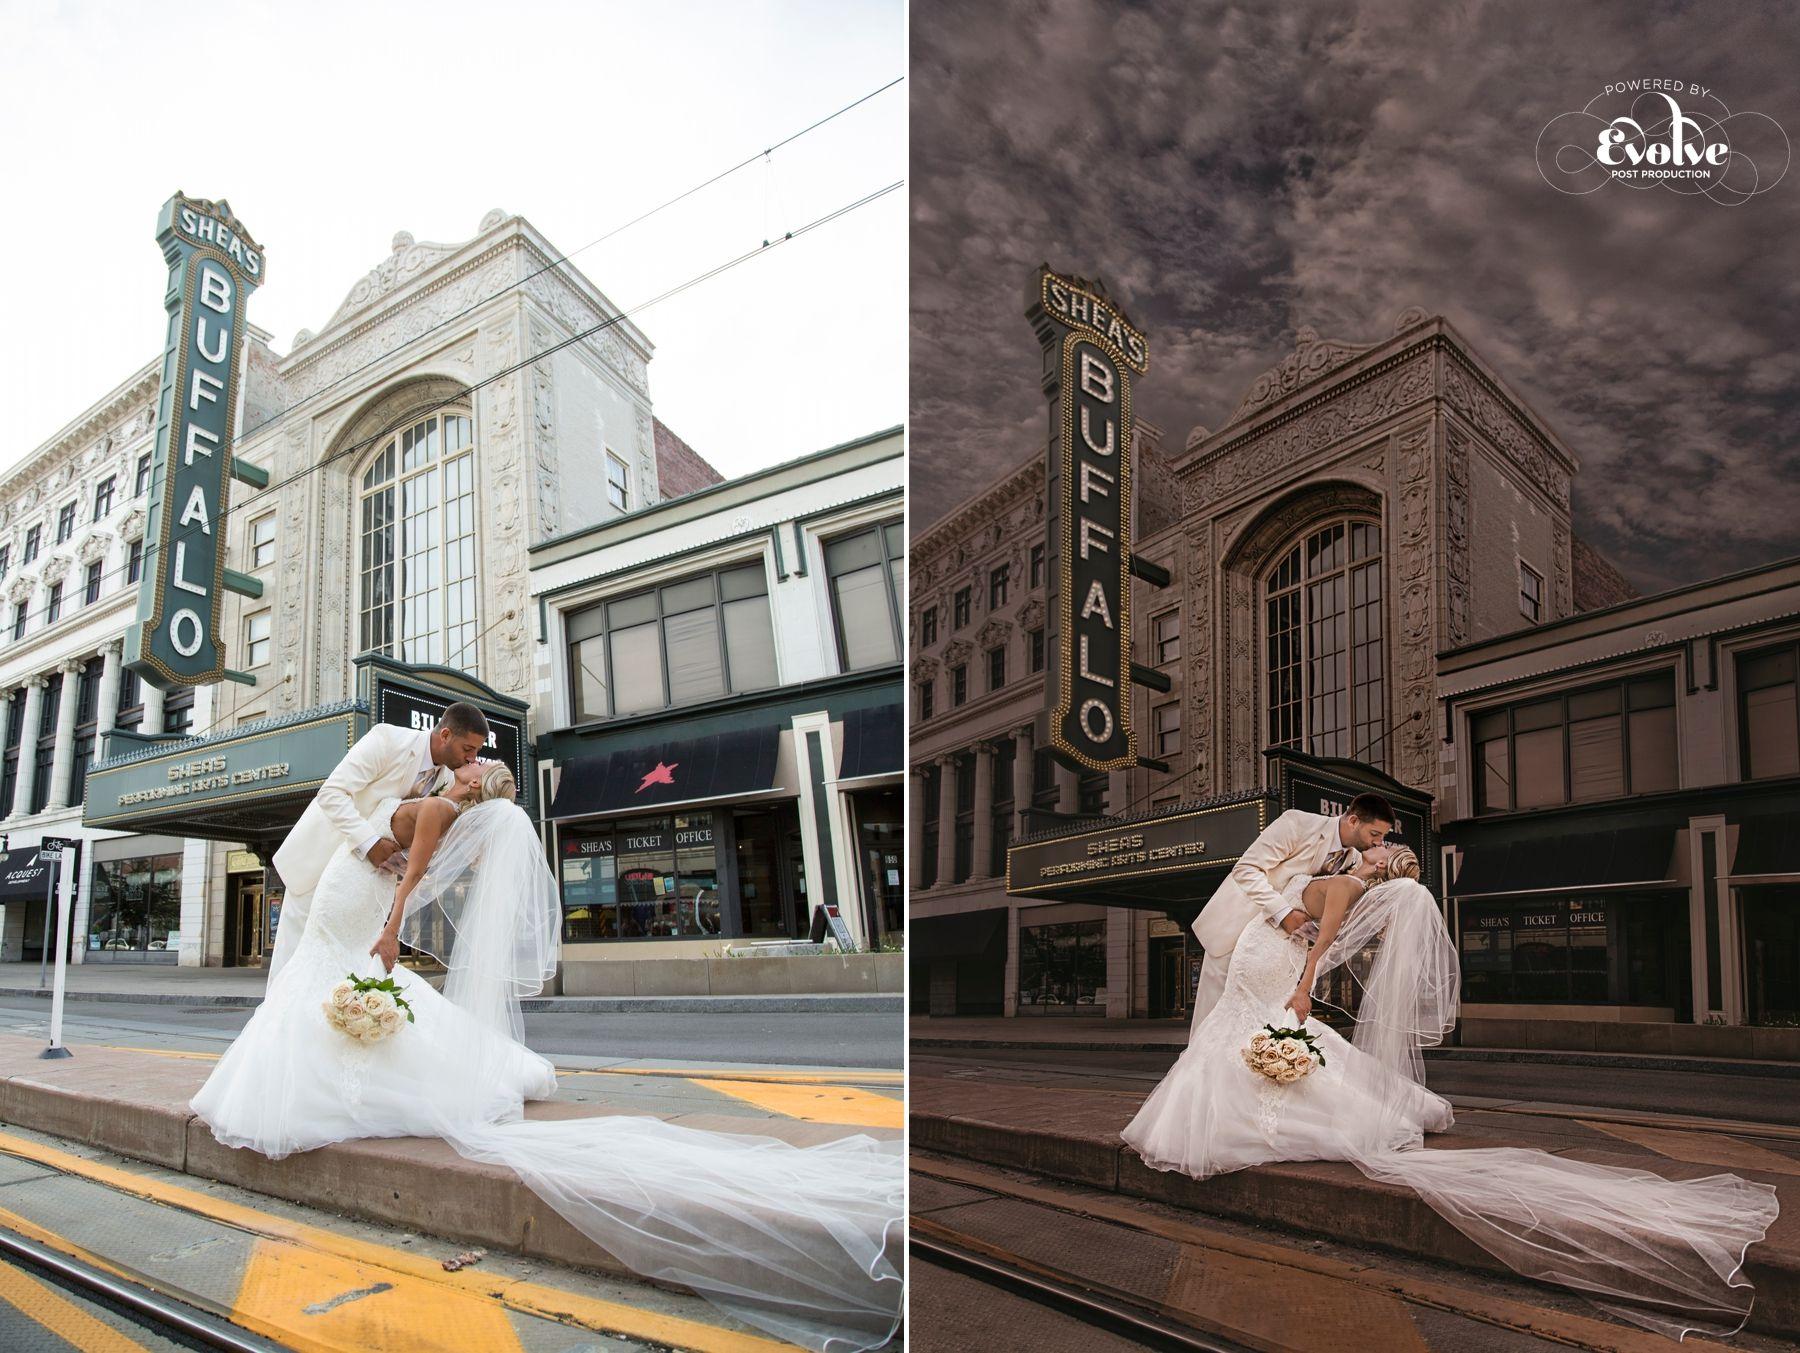 The phenomenon of wedding photography 94